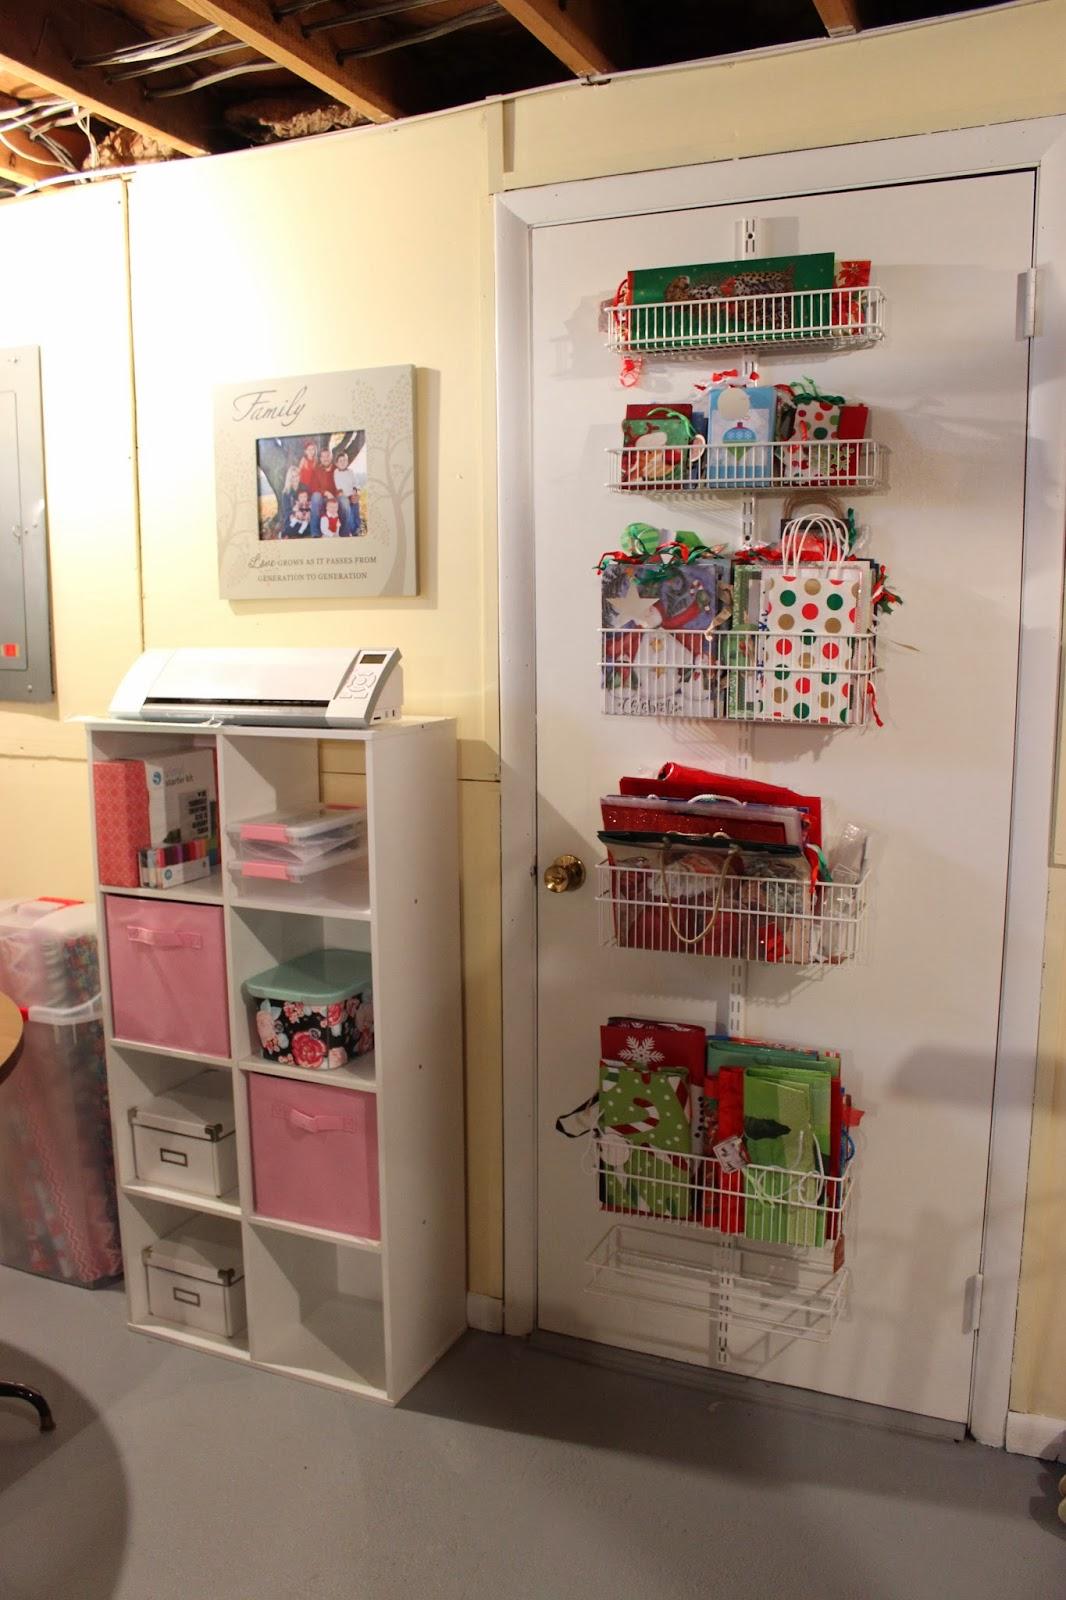 Genial Door Magazine Holder Organizing For Six My Organized Scrap Wrap Room 7